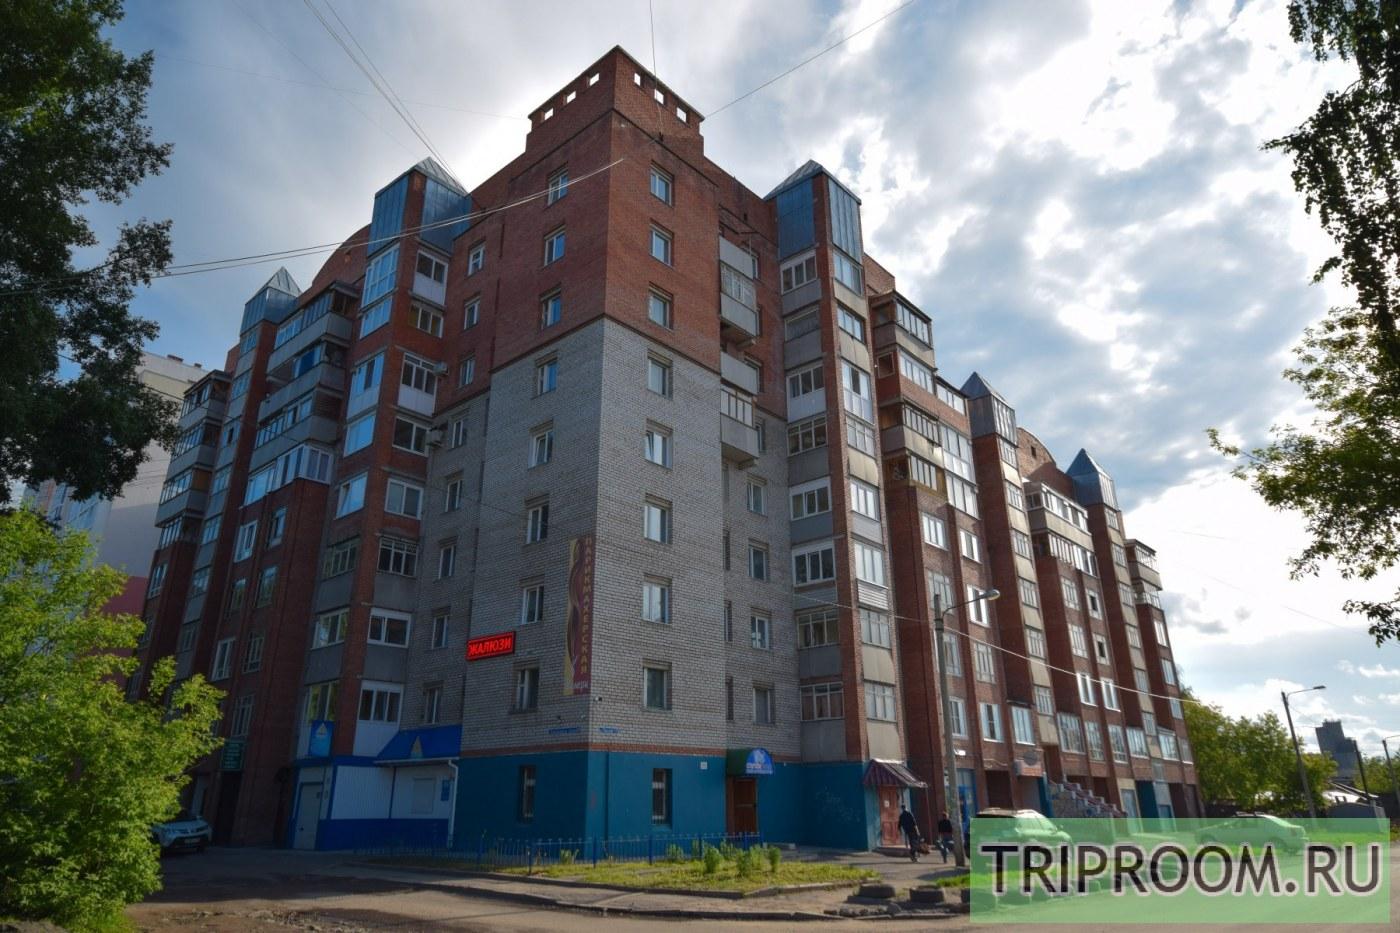 1-комнатная квартира посуточно (вариант № 36547), ул. Тихий переулок, фото № 23